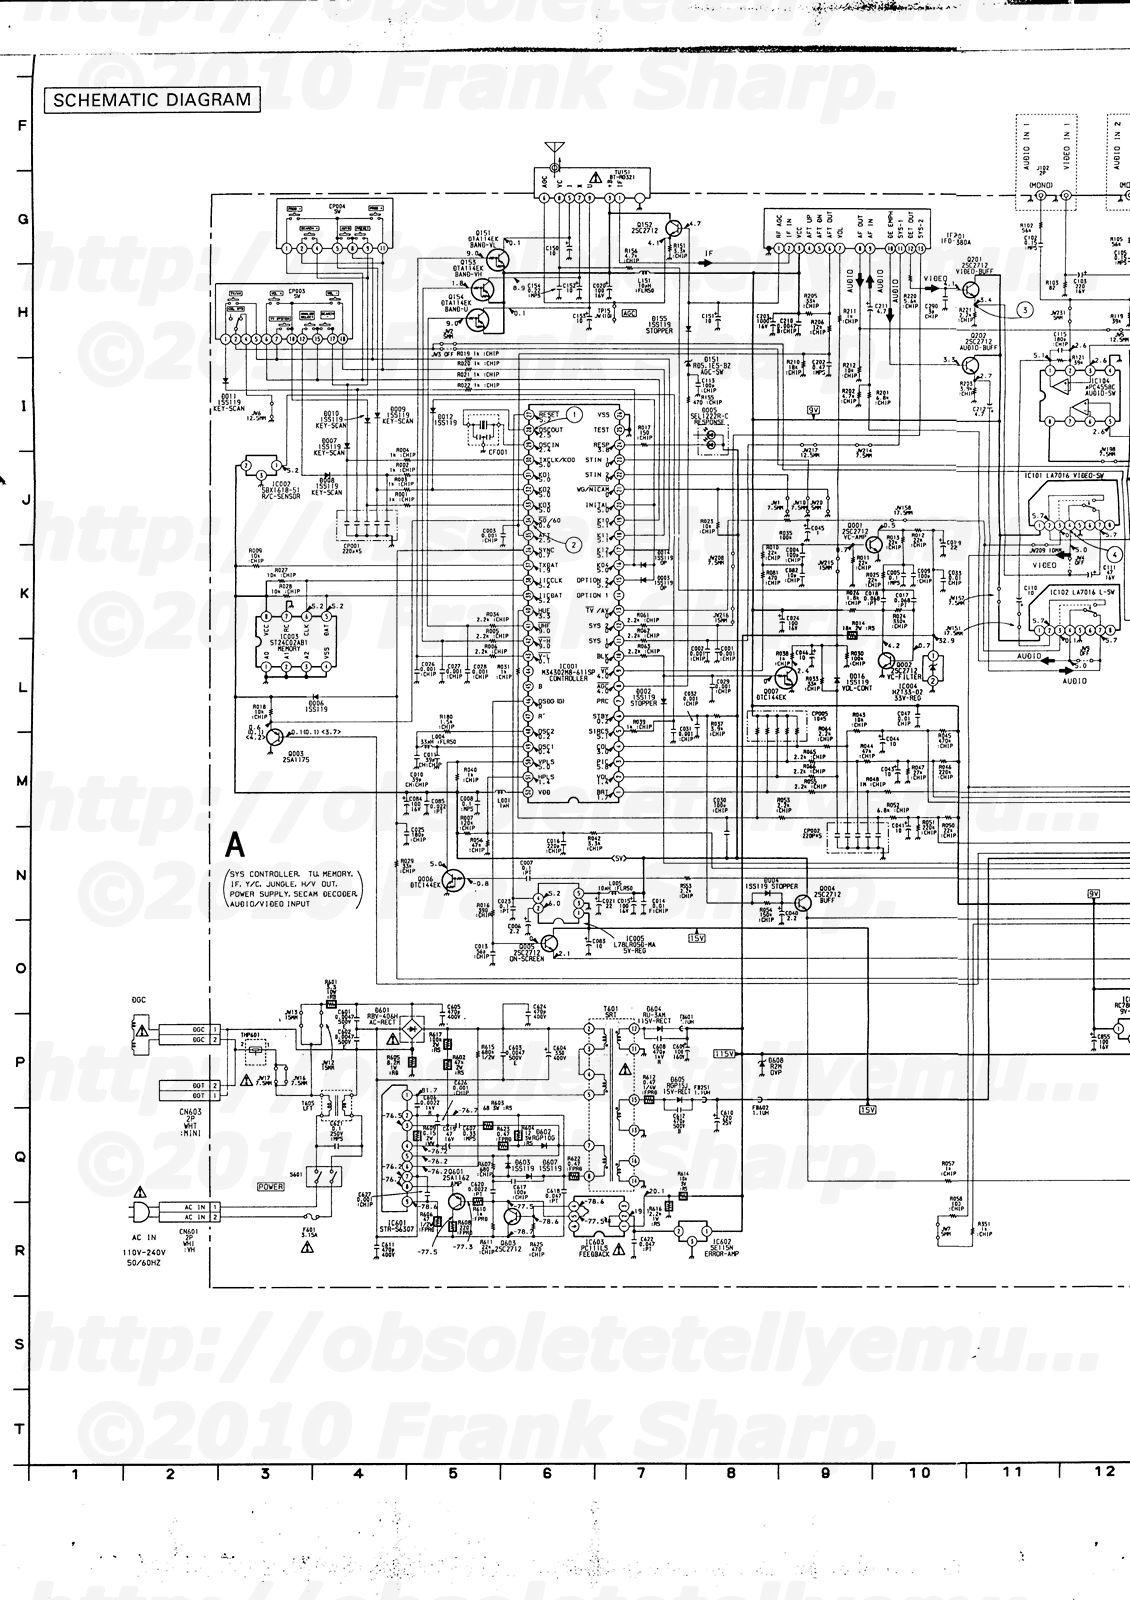 Obsolete Technology Tellye Sony Kv Mt Chassis Scc